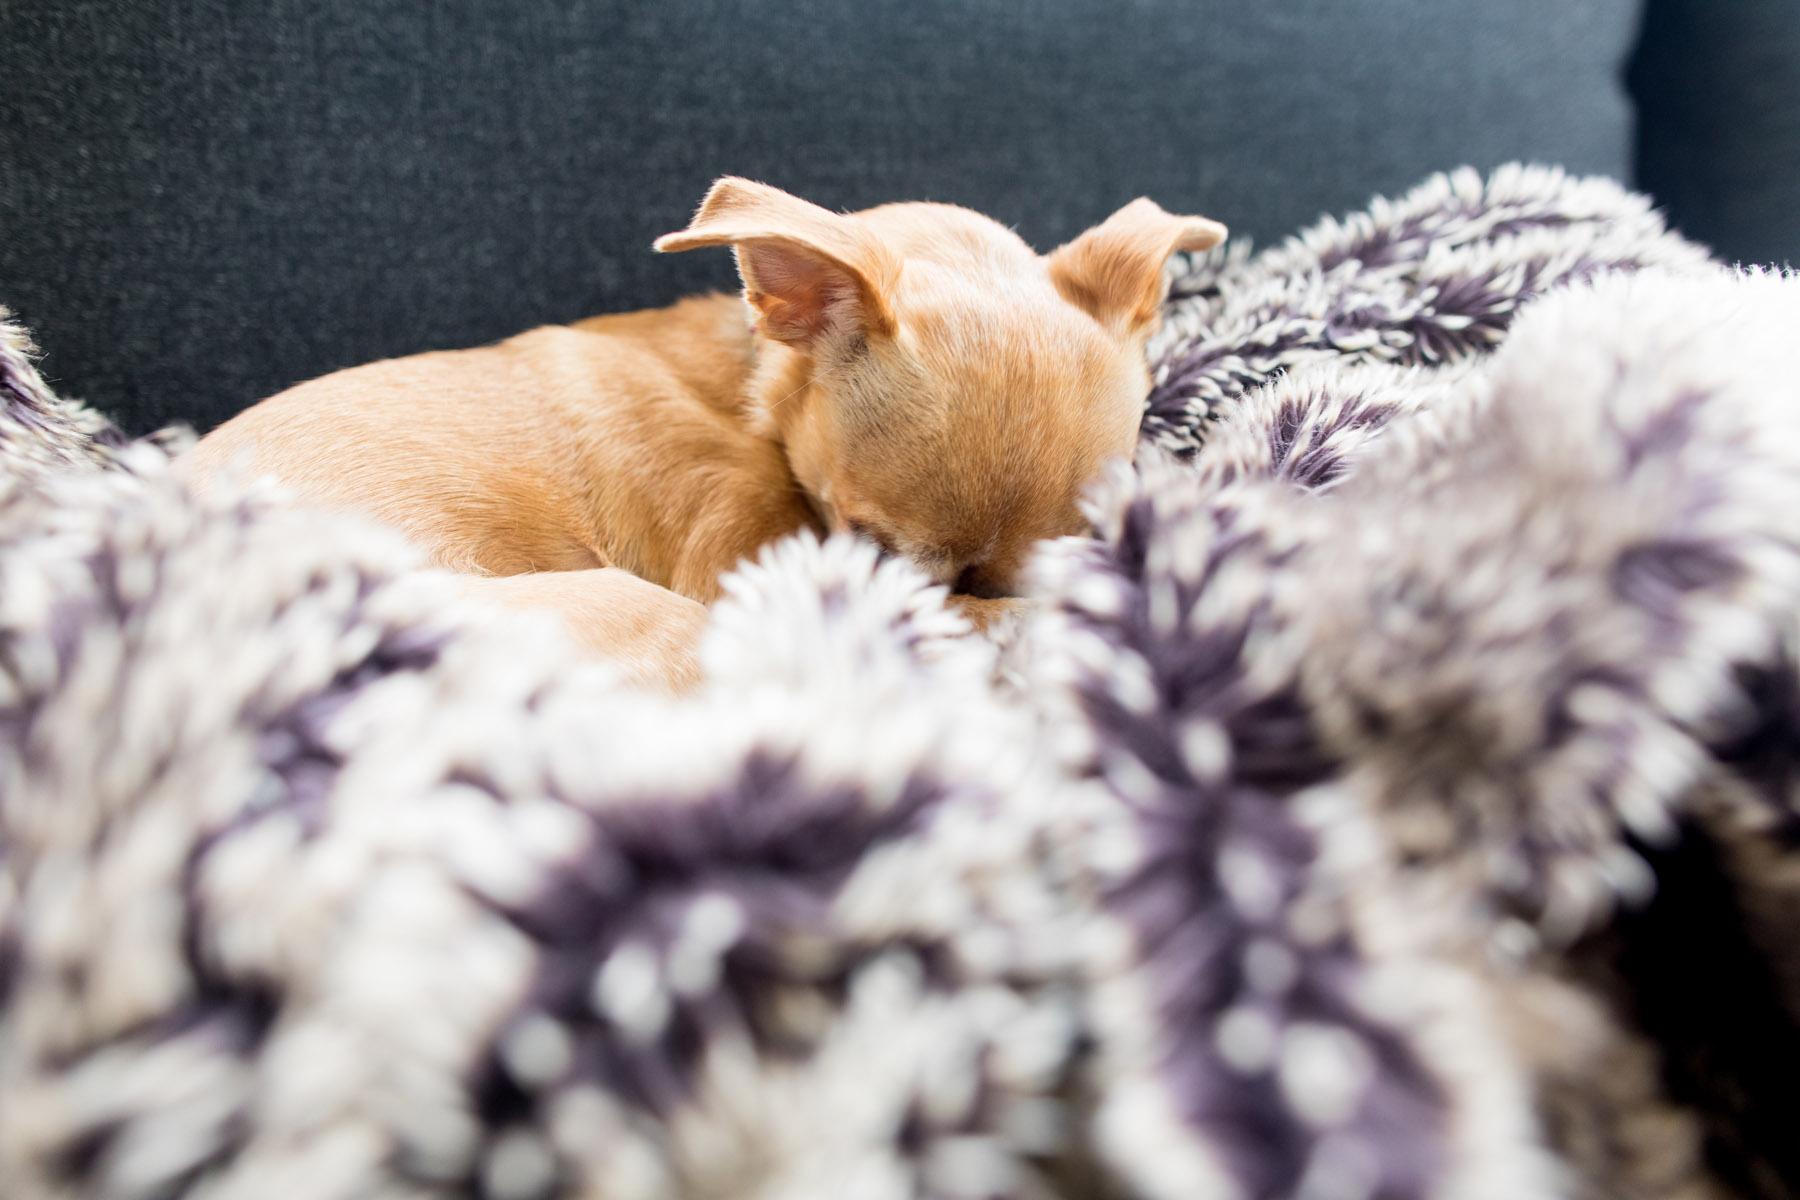 Dolly, RaeLynn's Chihuahua | © Sara Kauss Photography 2020